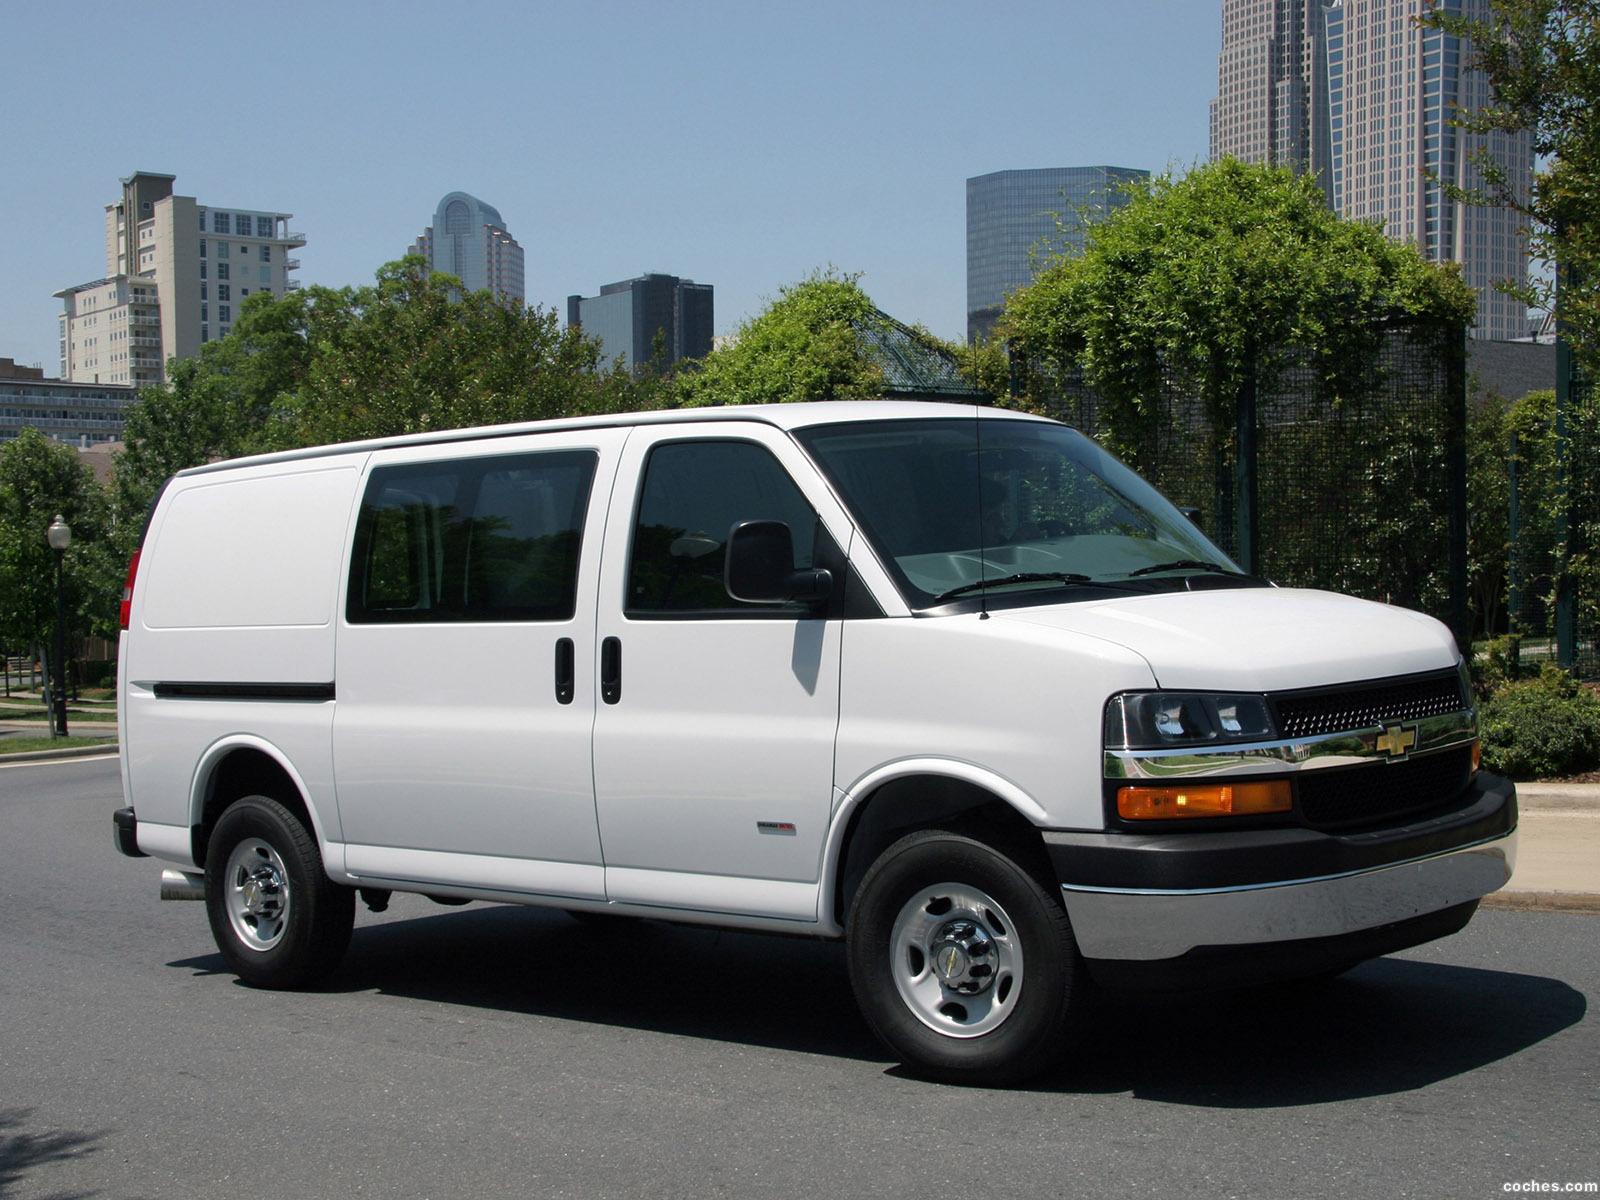 Fotos de Chevrolet Express Cargo Van 2002